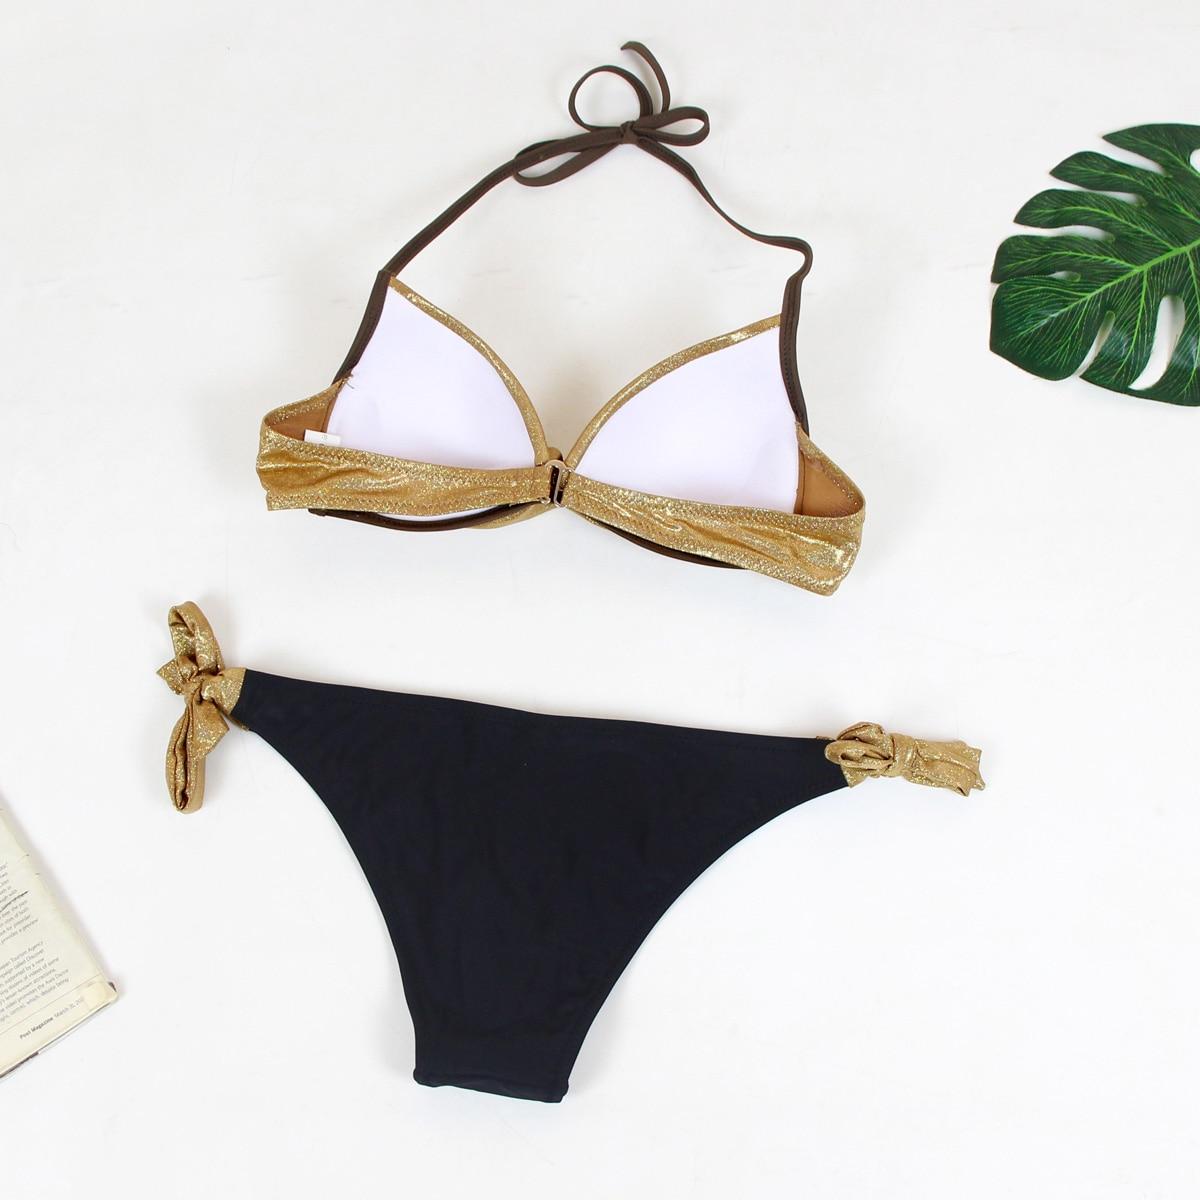 HTB1bKNzN4TpK1RjSZFMq6zG VXau Snake Skin Splicing Backless Bandage Swimwear Sexy Bikini New Swimsuit Women Swimwear Bikini Set Push Up Swim Suit  Women